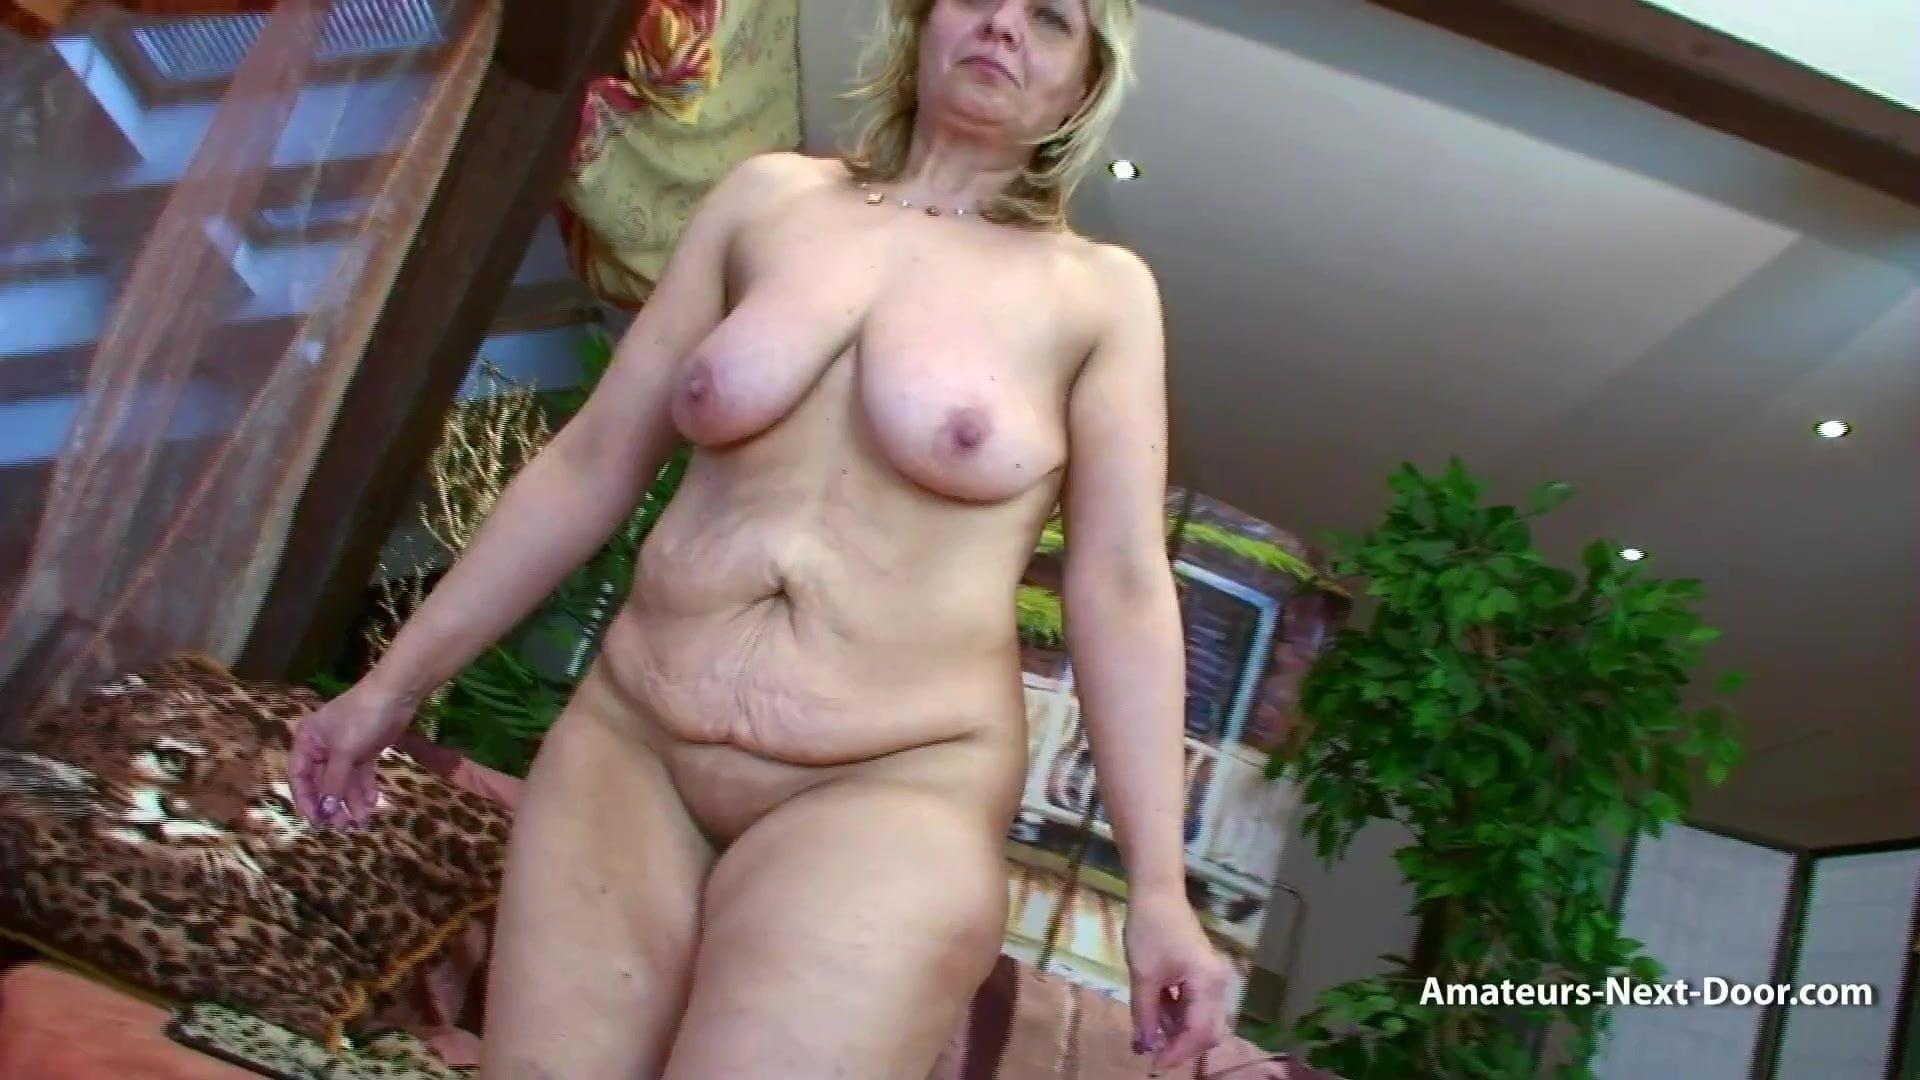 gujrati woman naked hd image